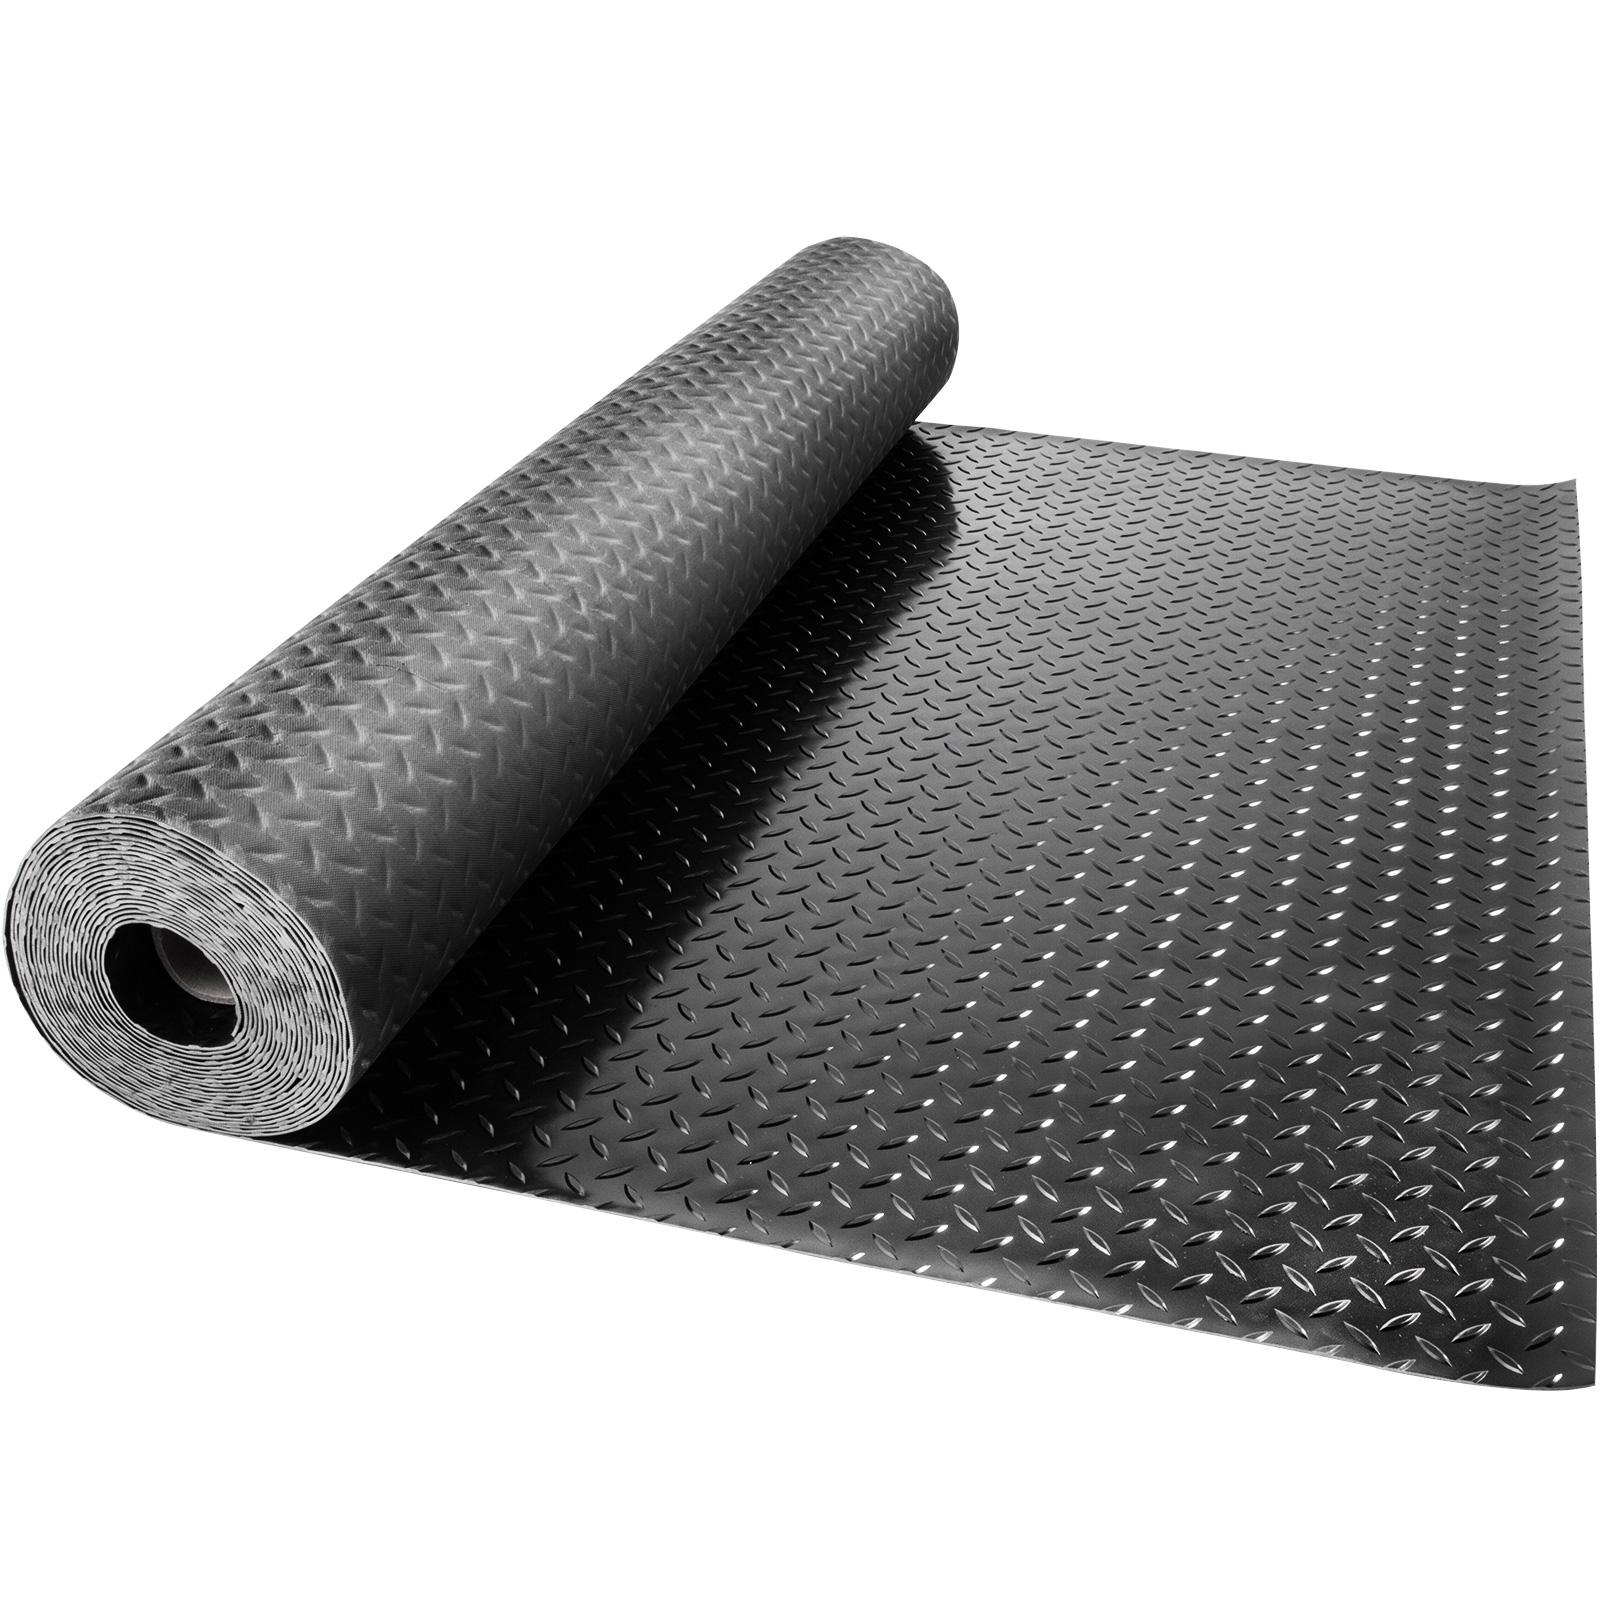 thumbnail 131 - Garage Flooring Mat Roll Car Trailer Floor Covering 1.1m Width Gym Floor Roll